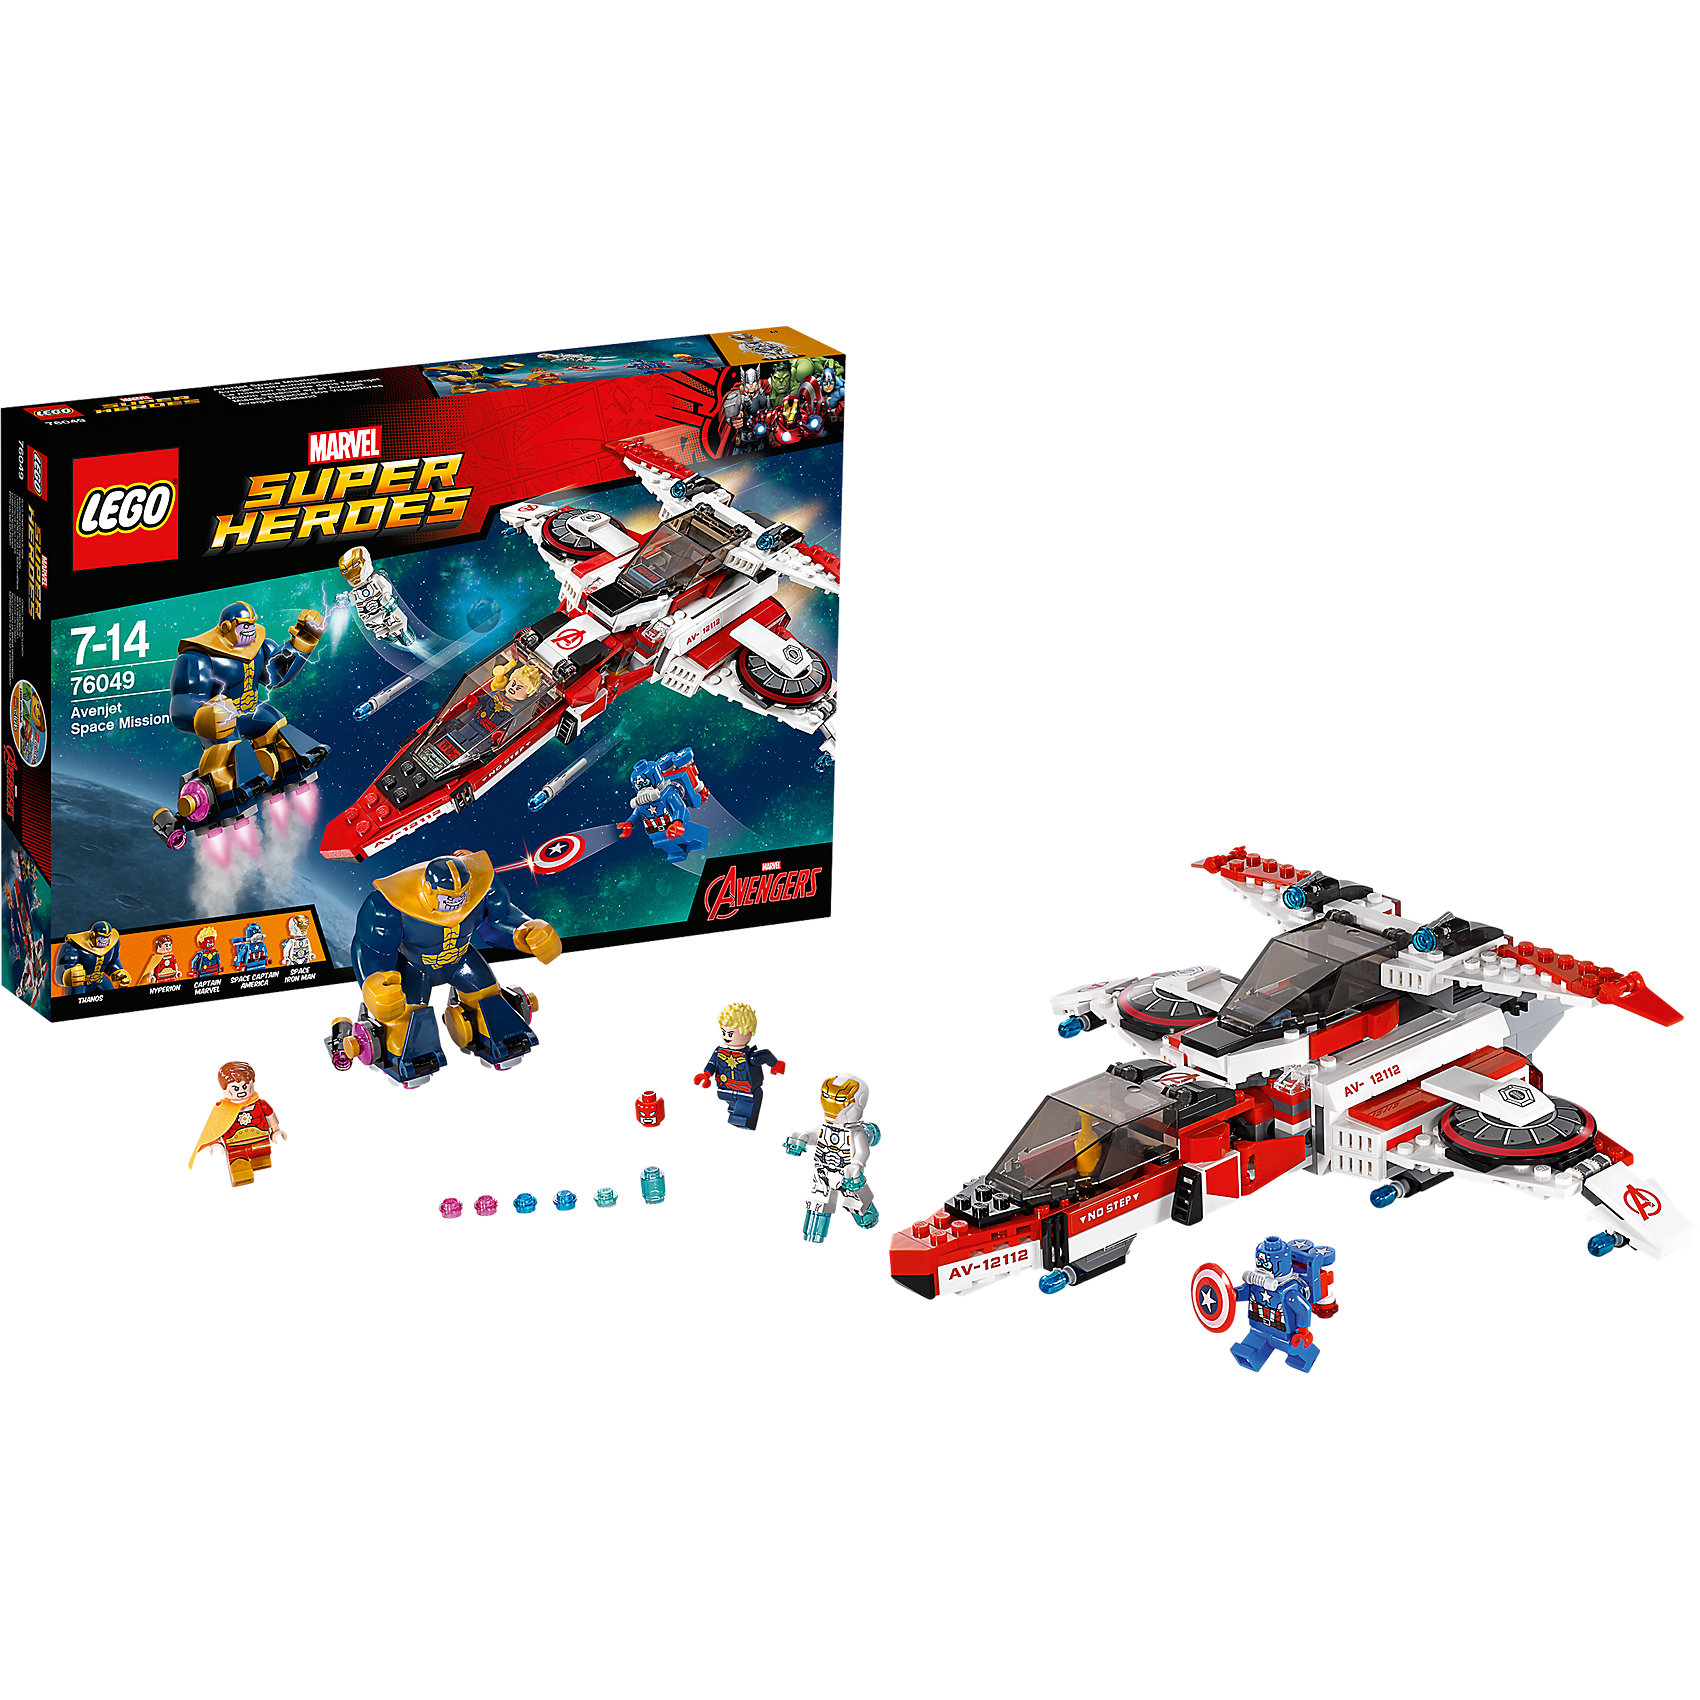 LEGO LEGO Super Heroes 76049: Реактивный самолёт Мстителей: космическая миссия lego lego super heroes 76049 реактивный самолёт мстителей космическая миссия